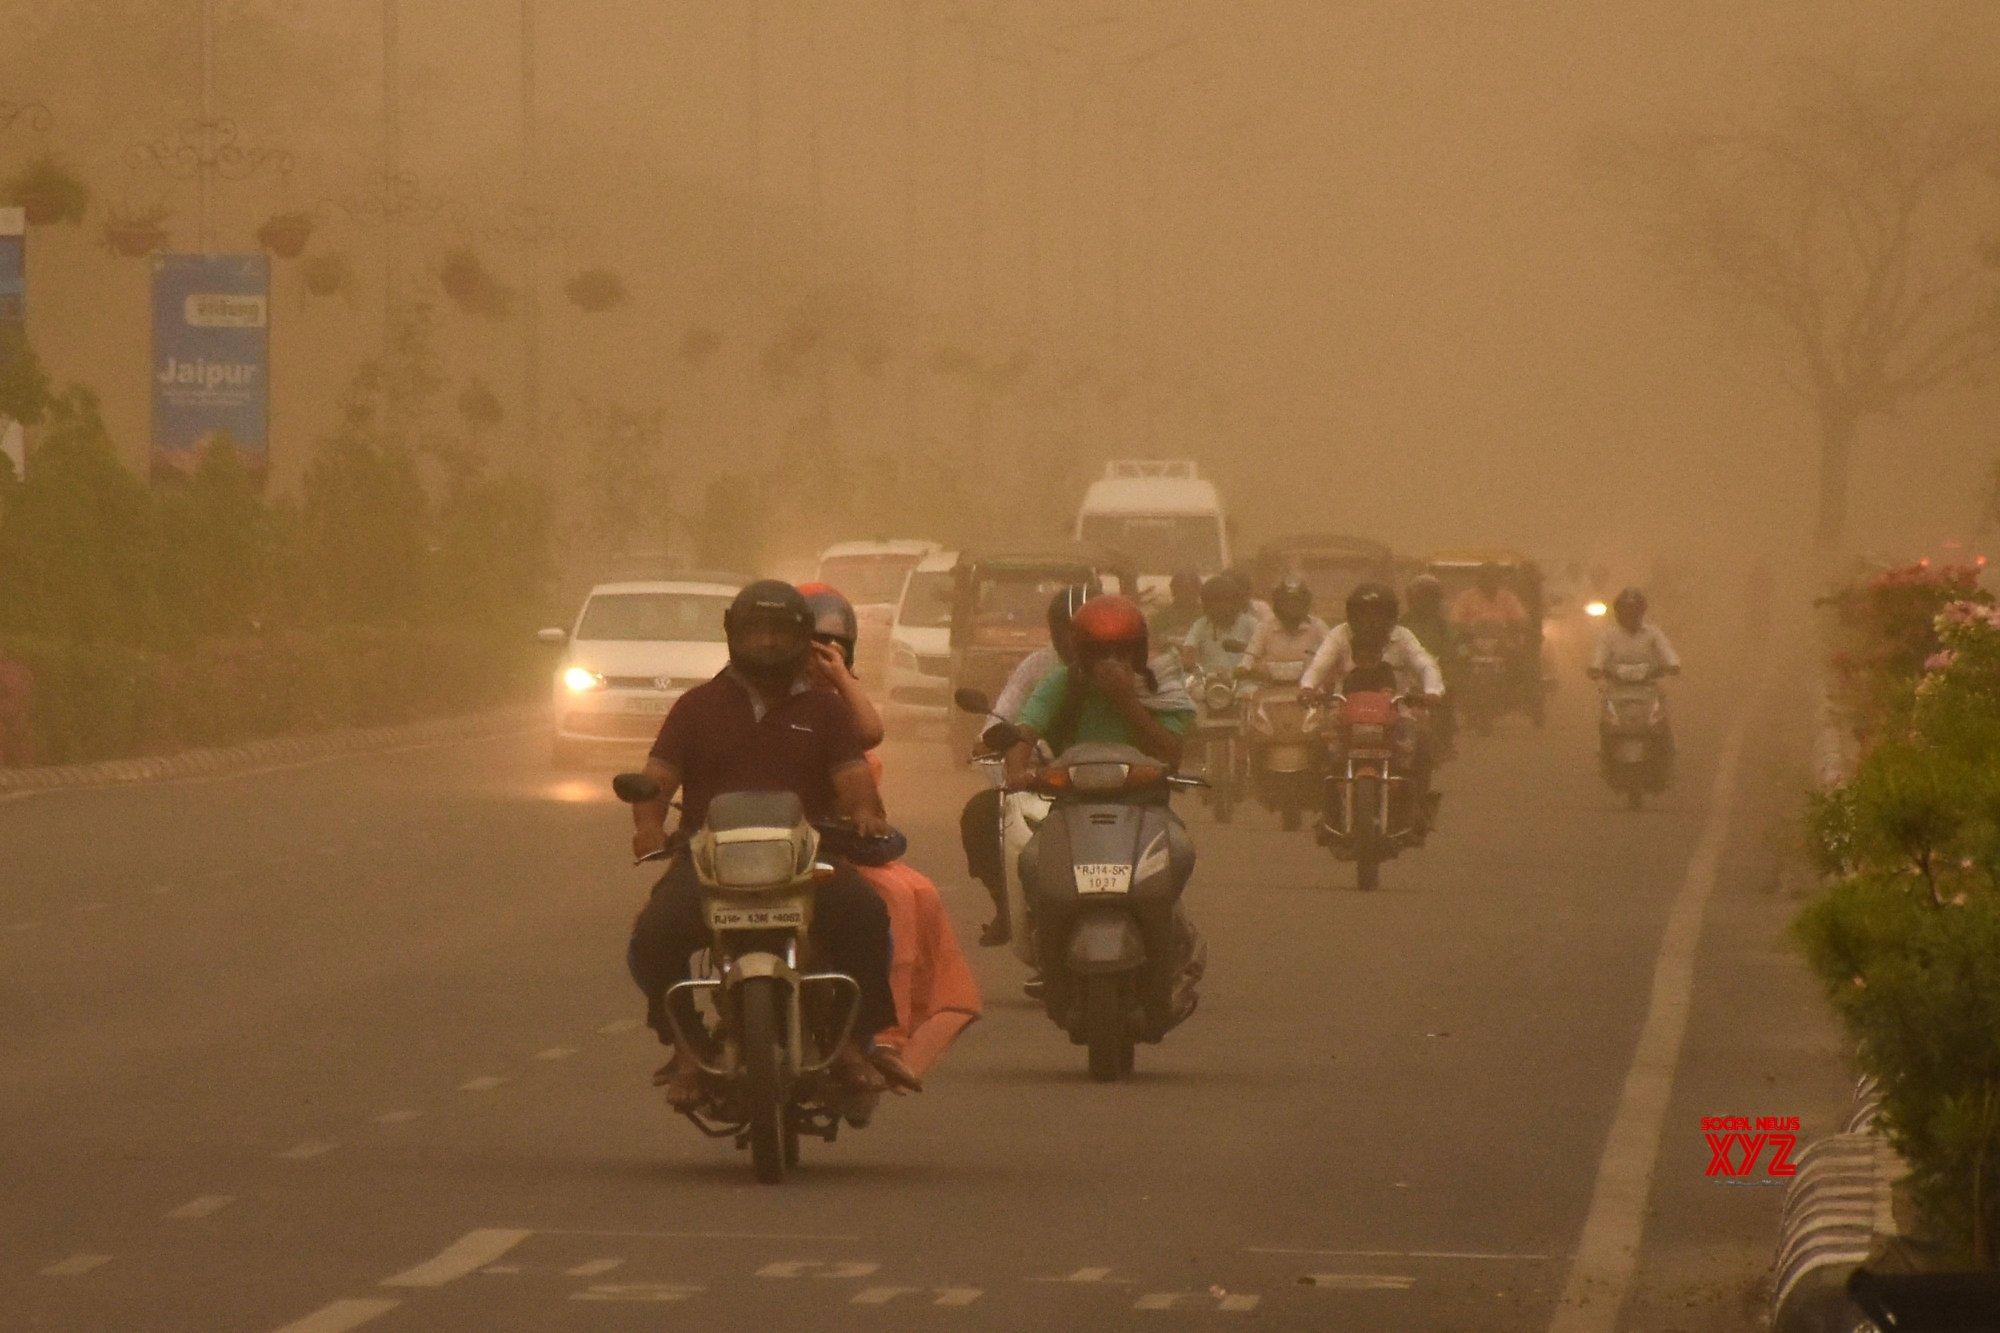 Jaipur: Dust storm #Gallery